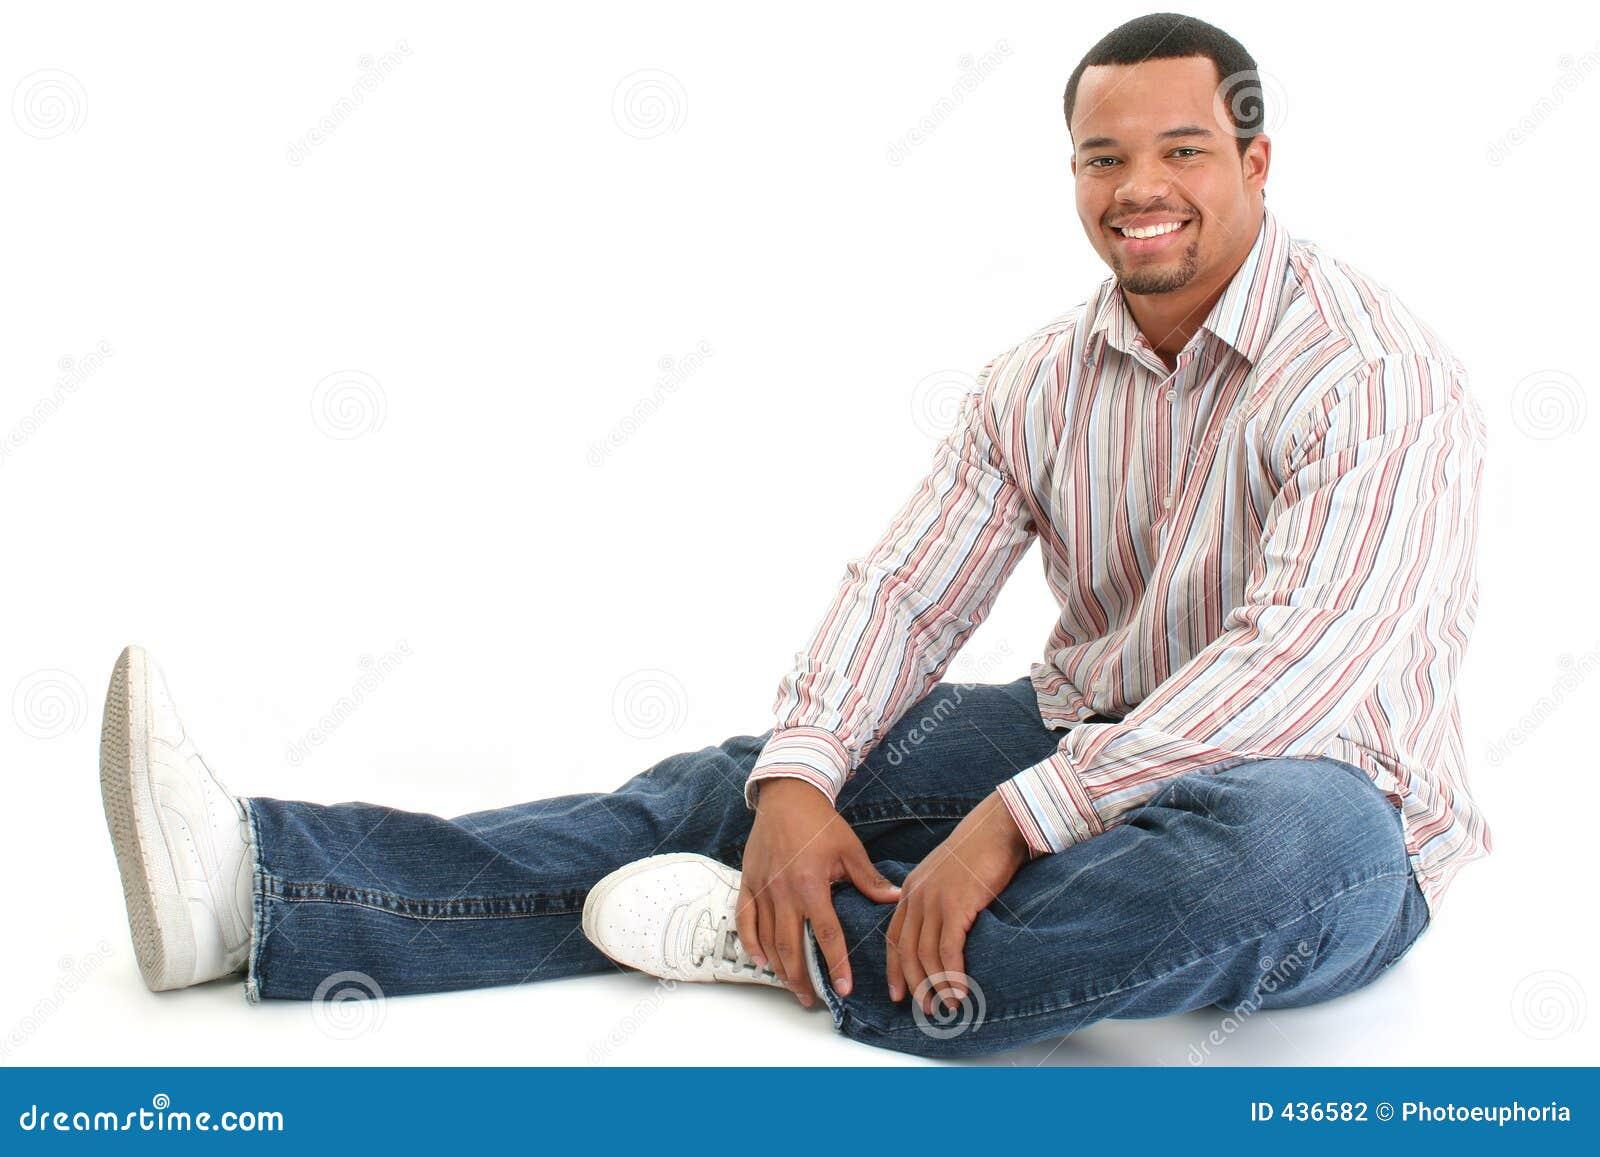 Handsome Male Sitting on floor